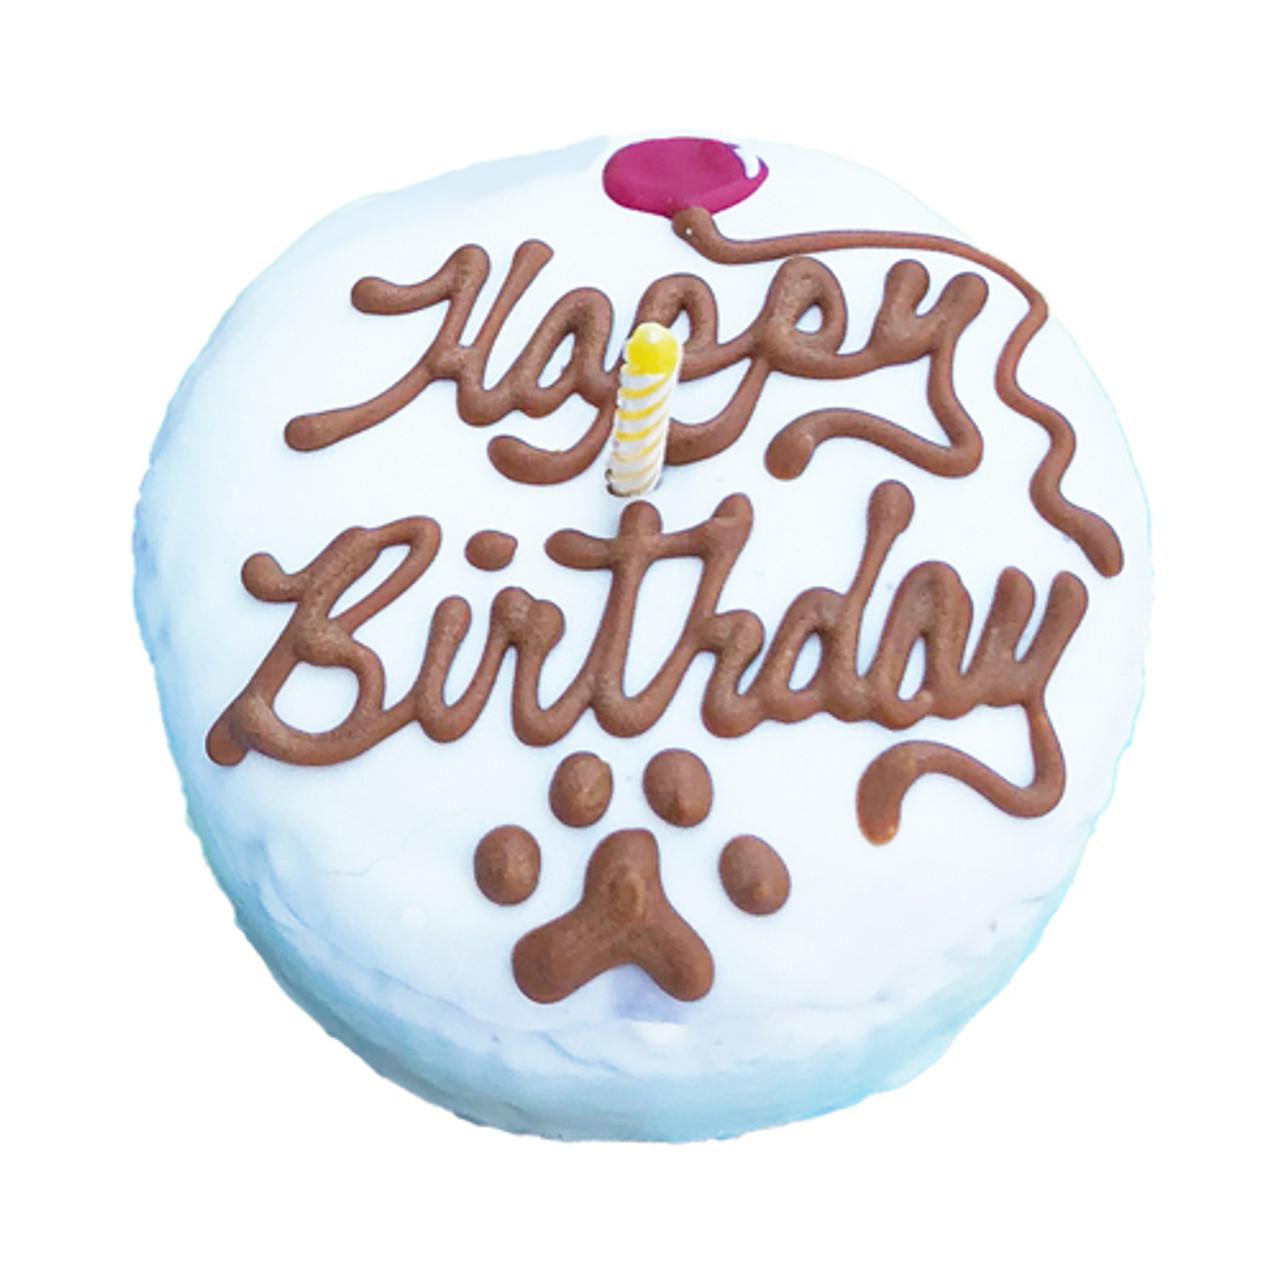 Awe Inspiring Dog Birthday Cake Round Mini Puppy Kisses Funny Birthday Cards Online Chimdamsfinfo